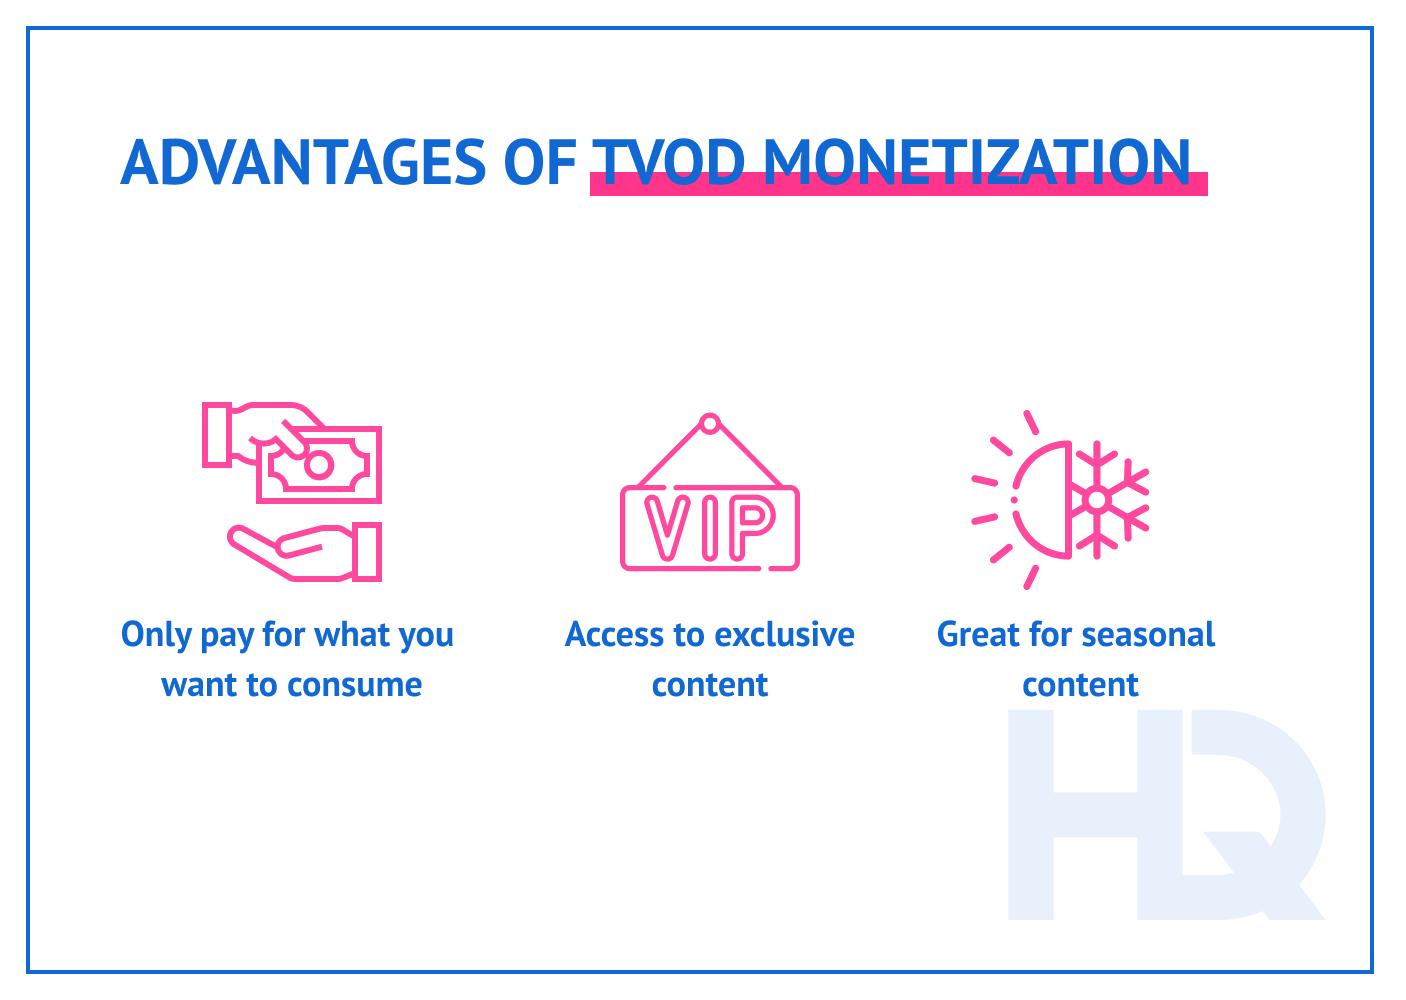 Advantages of TVoD monetization model.